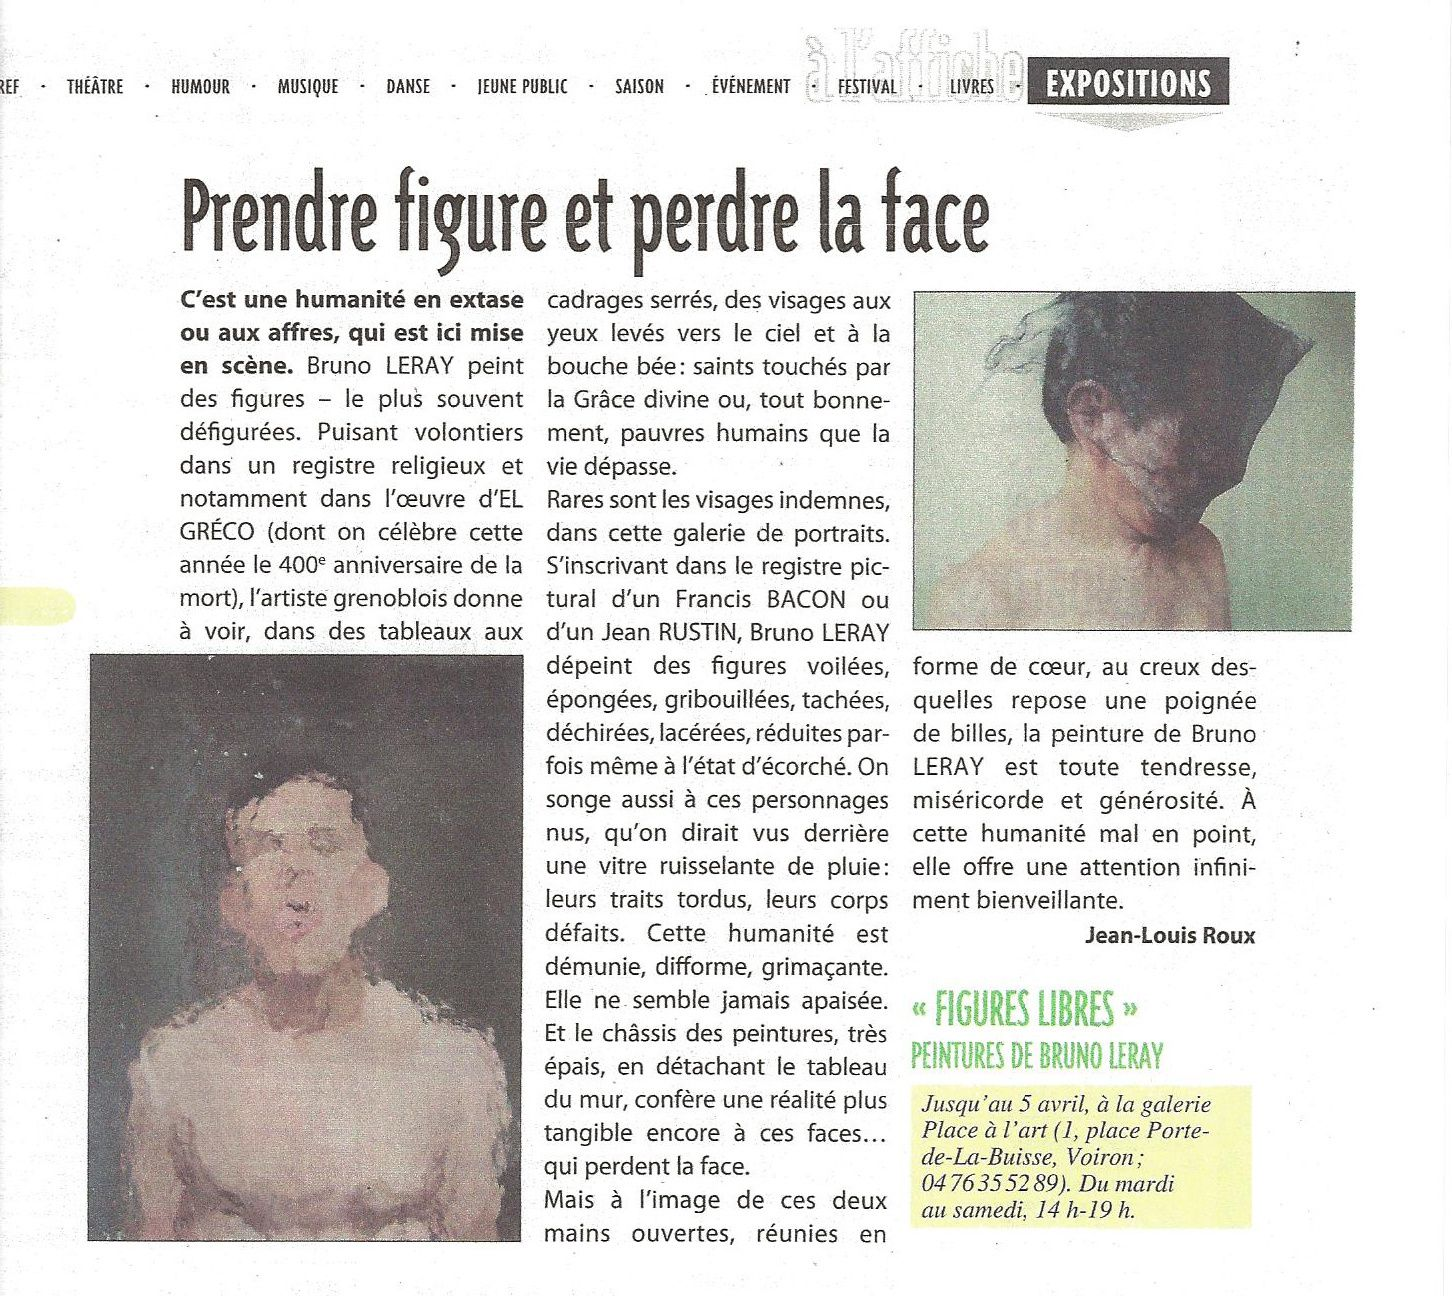 Bruno LERAY: du 11 mars au 5 avril 2014